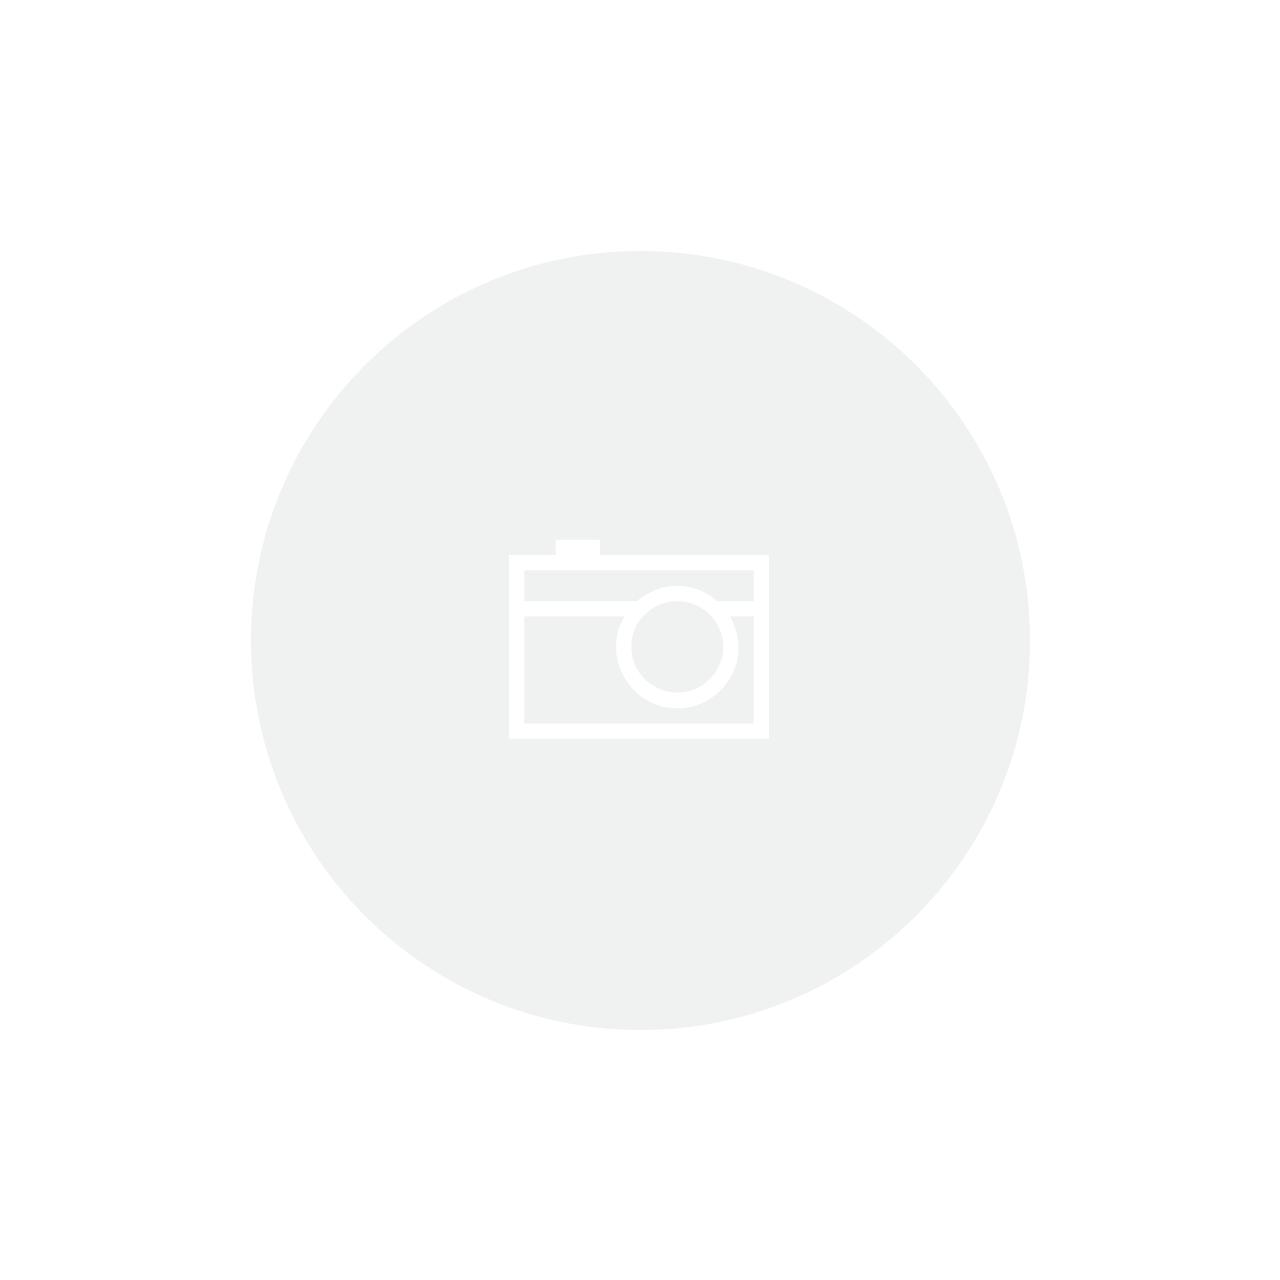 Placa de Vídeo VGA NVIDIA EVGA GEFORCE GTX 1080 TI Founders Edition 11GB GDDR5X 11G-P4-6390-KR